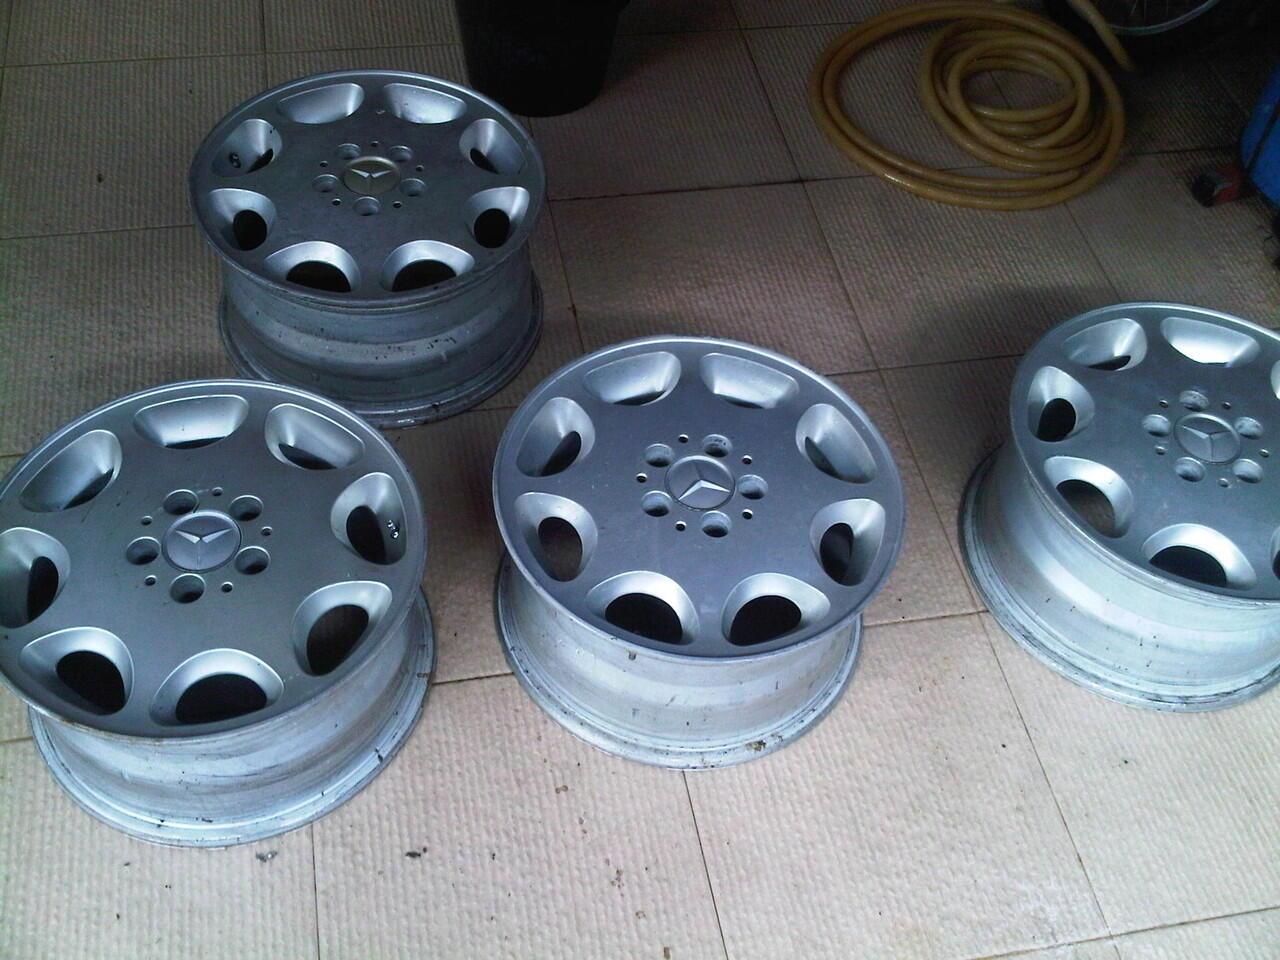 wts : velg std S 320 W140 thn 96-98